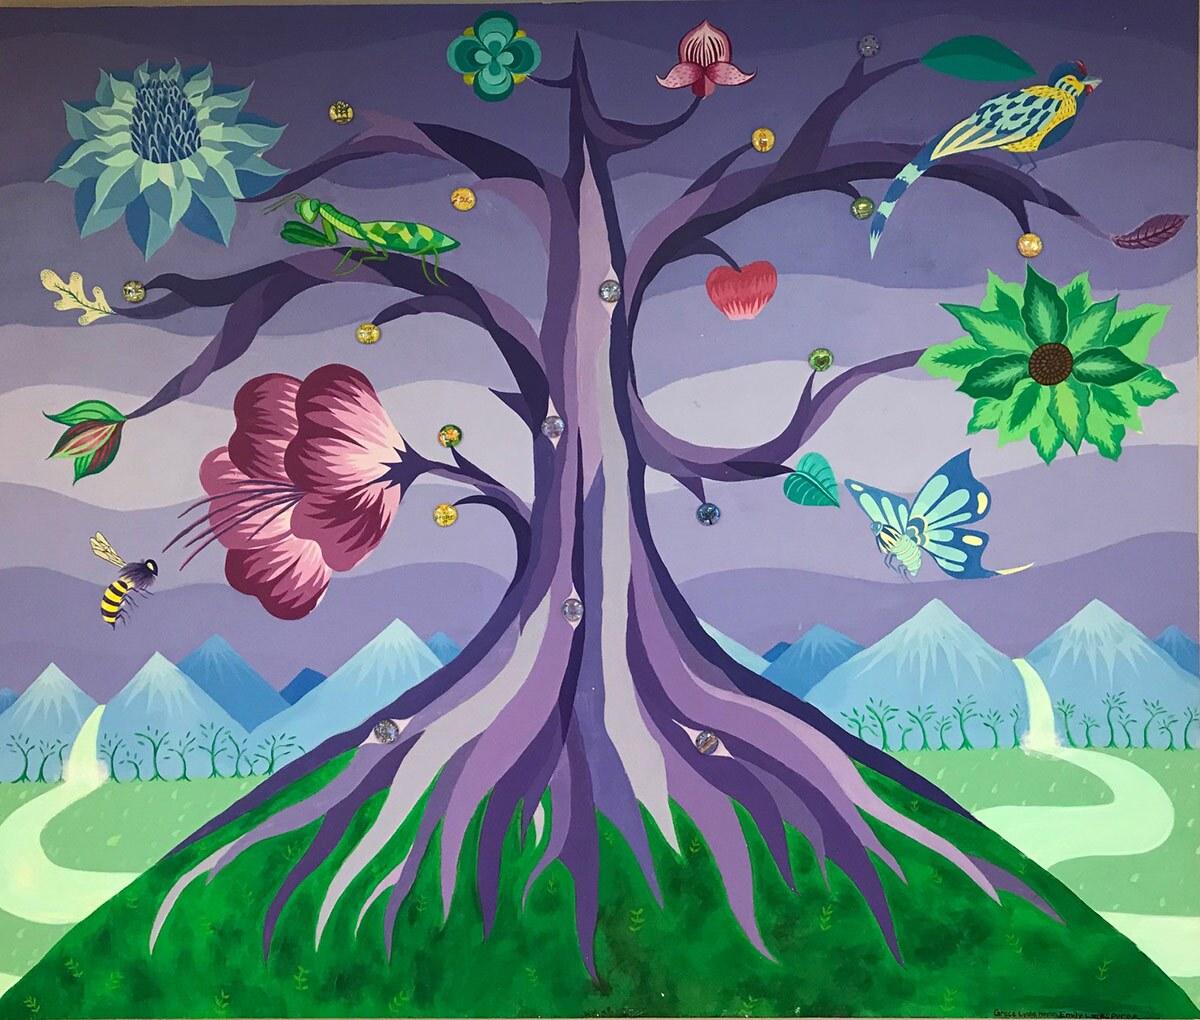 Willowbrook Touchstone Healing Room Mural (2019) by Grace Lynne Haynes.